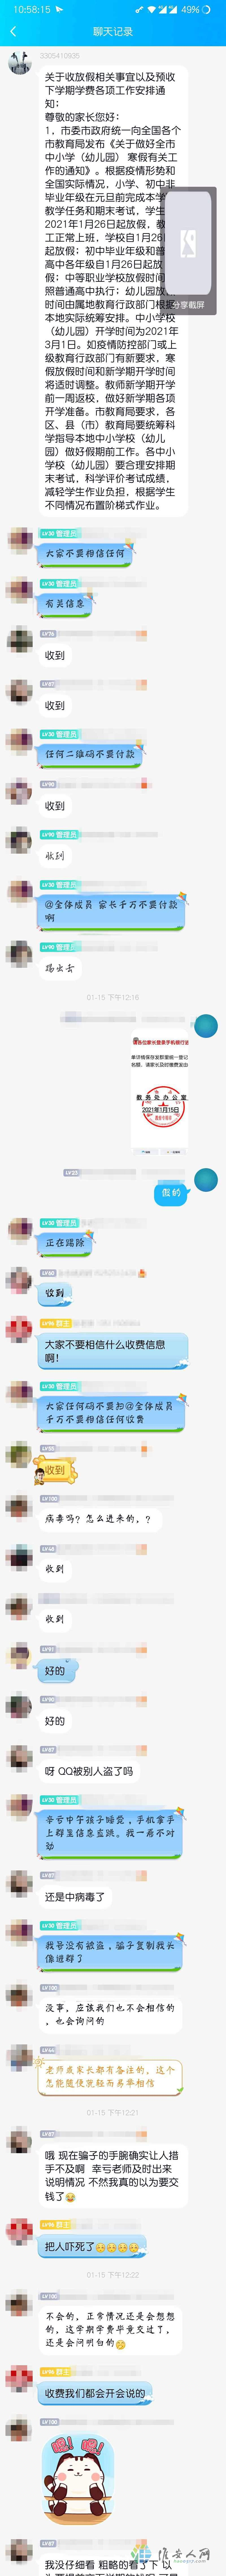 QQ图片20210123110234_副本_副本.jpg